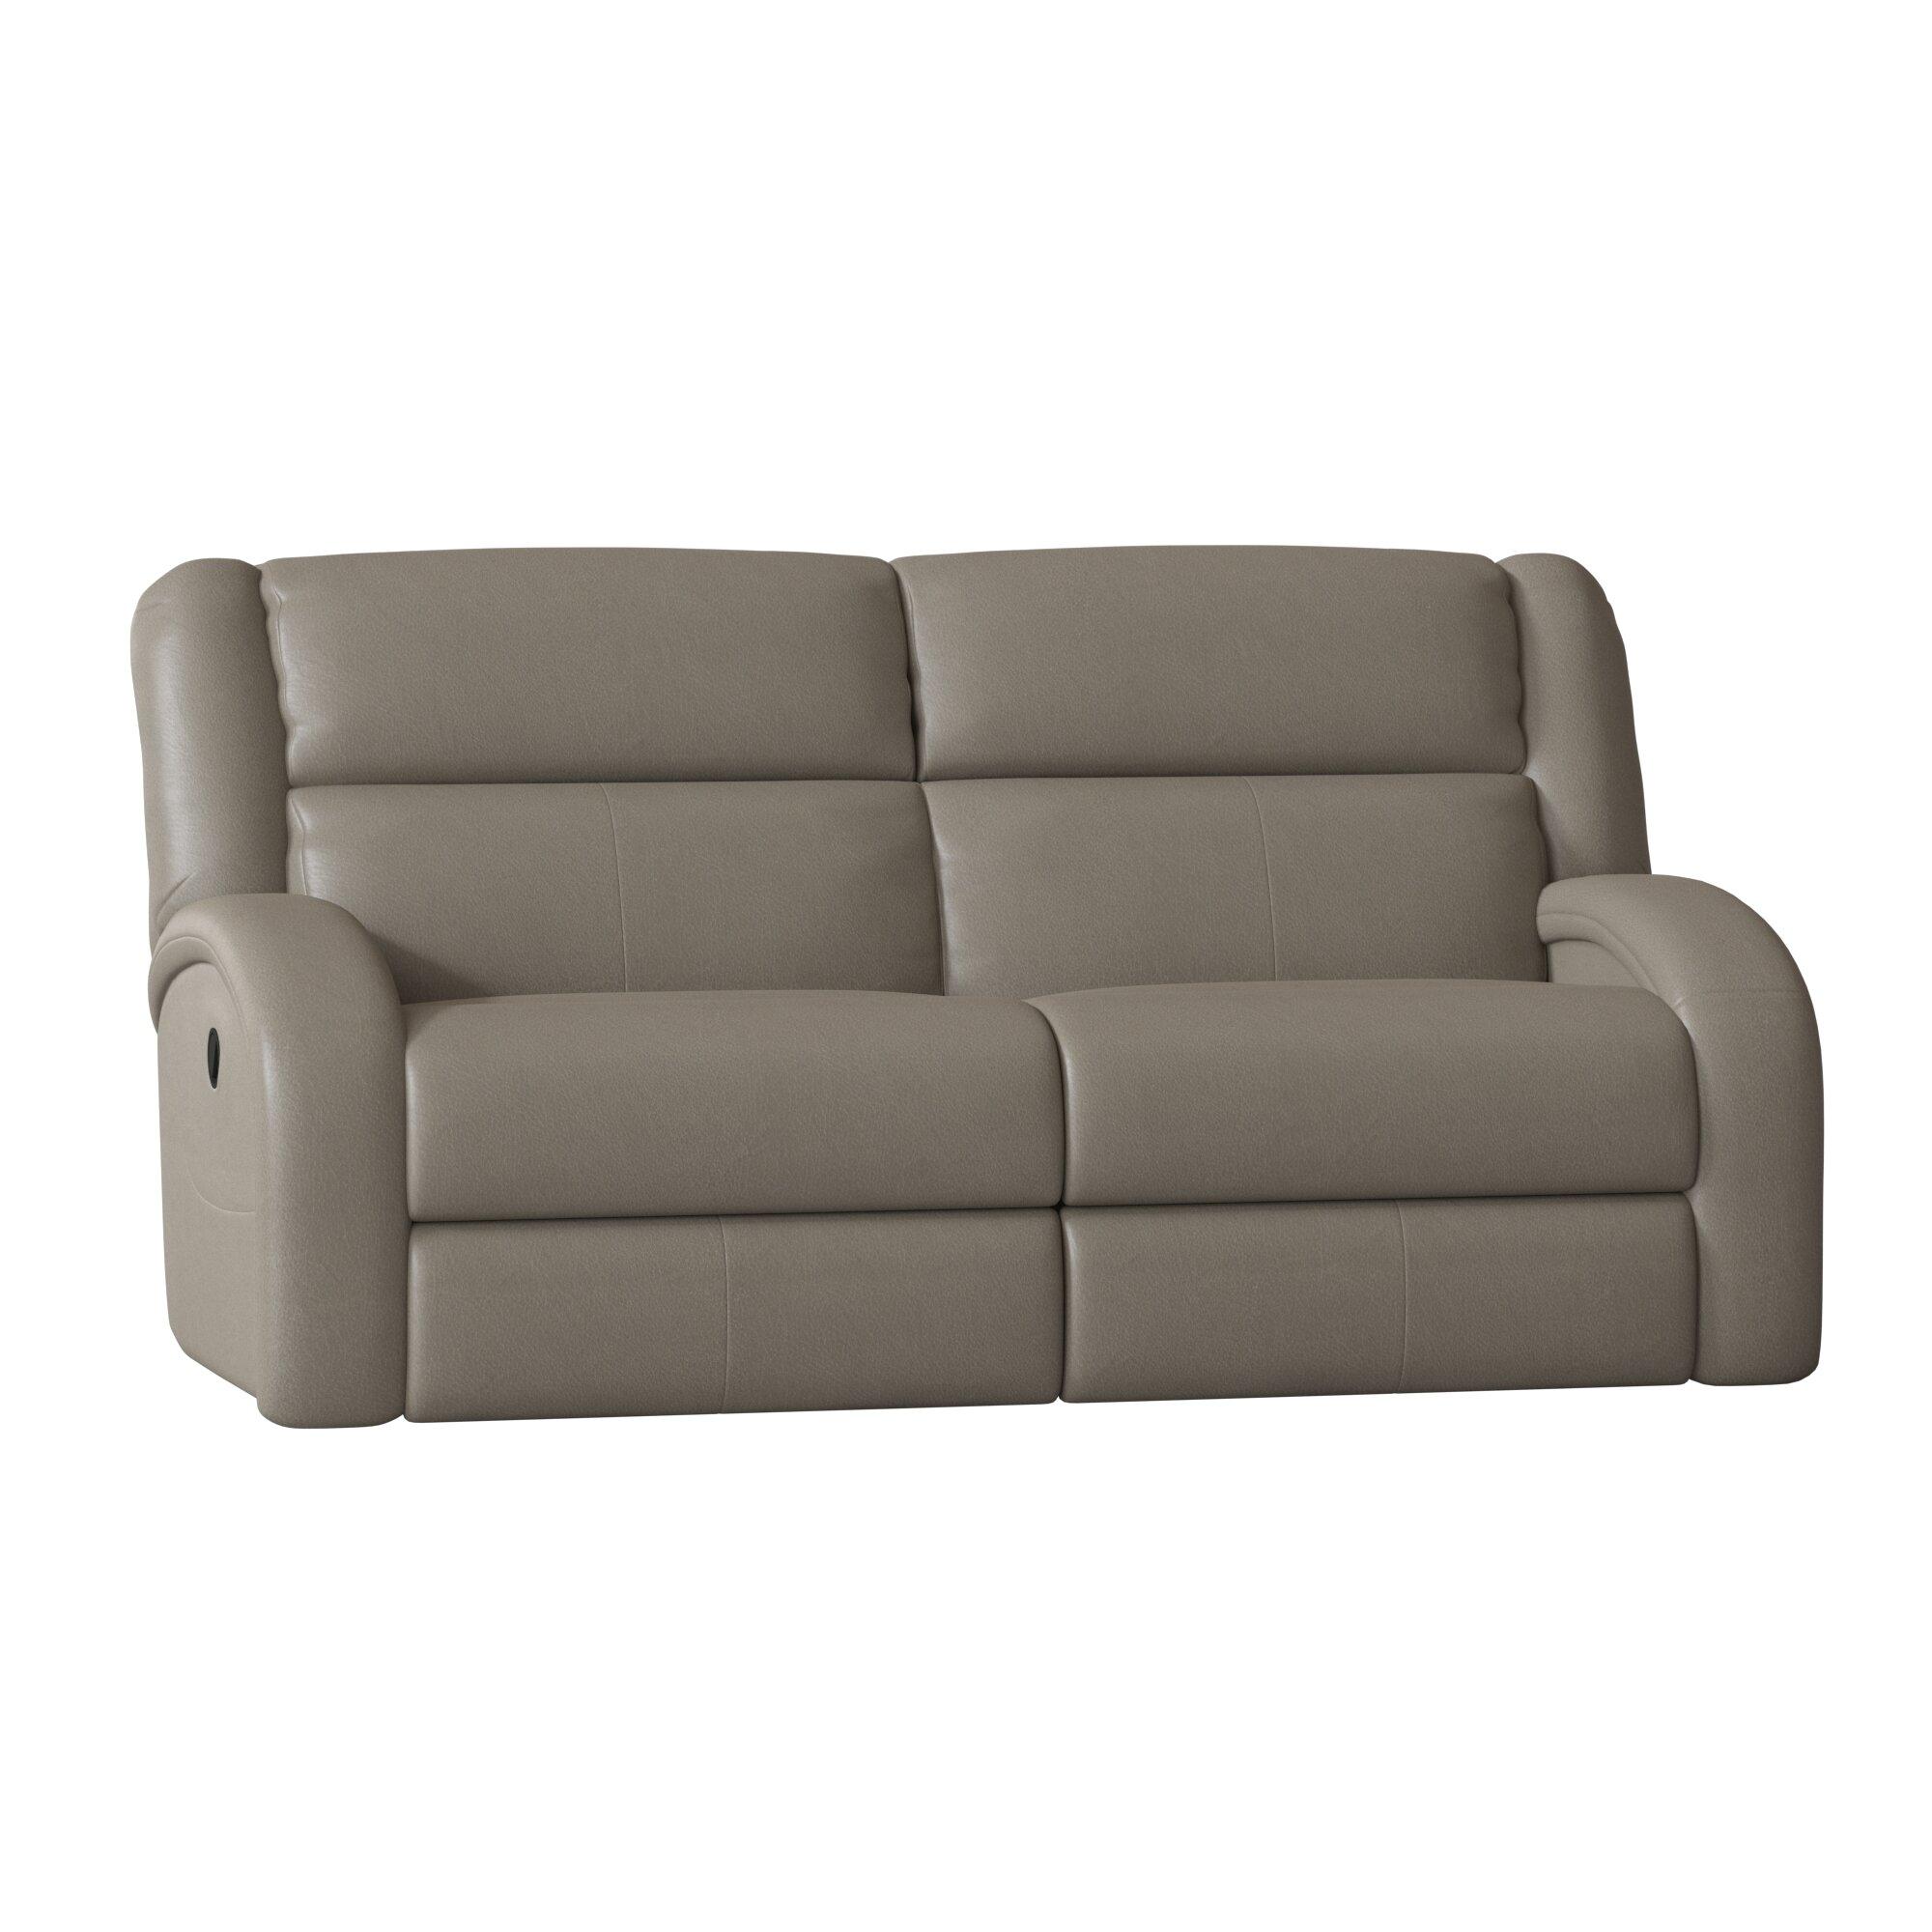 Terrific Maverick Leather Reclining Loveseat Uwap Interior Chair Design Uwaporg